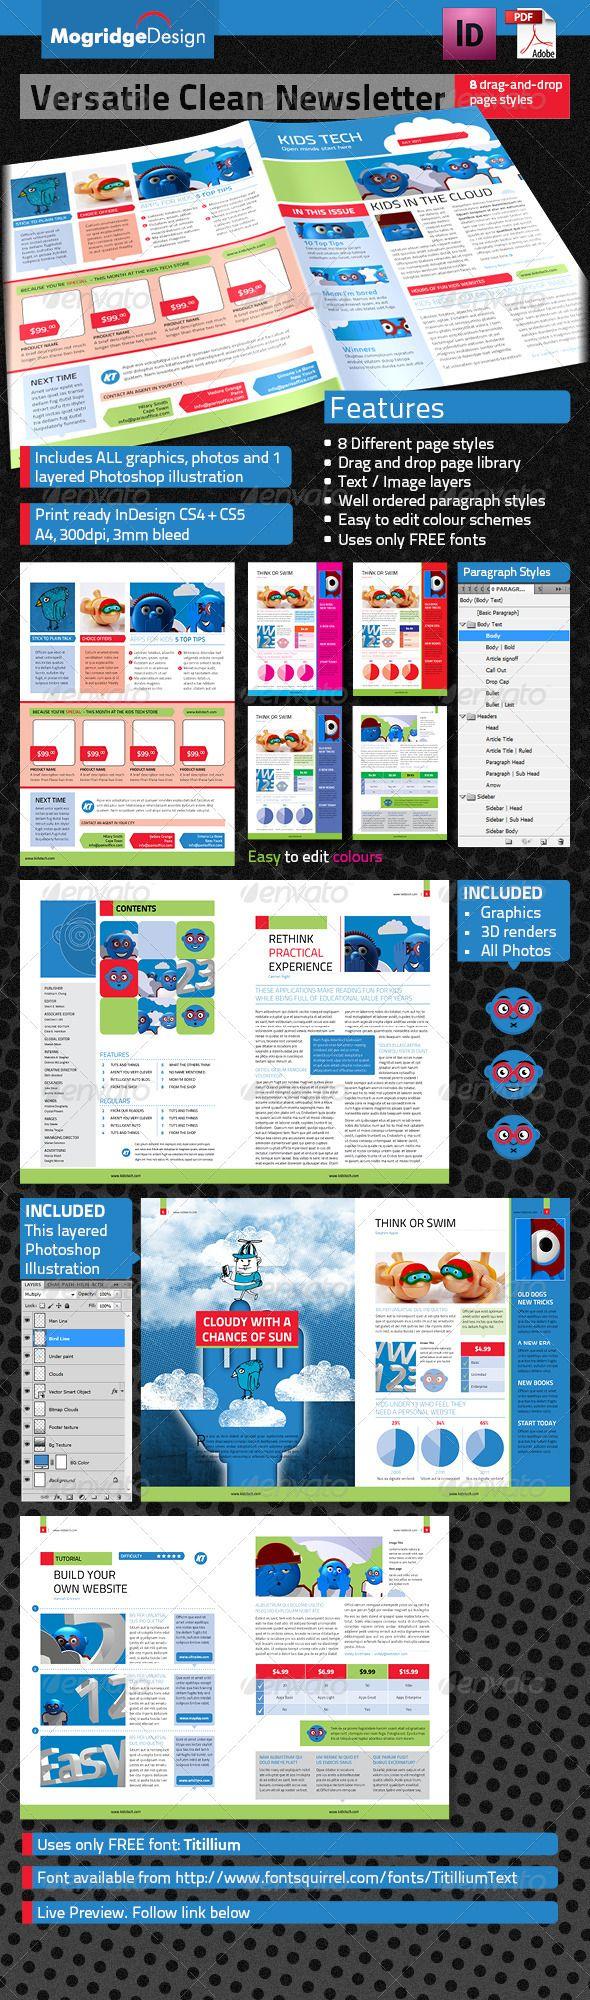 ezime online store newsletter 5 different layout by bluenila